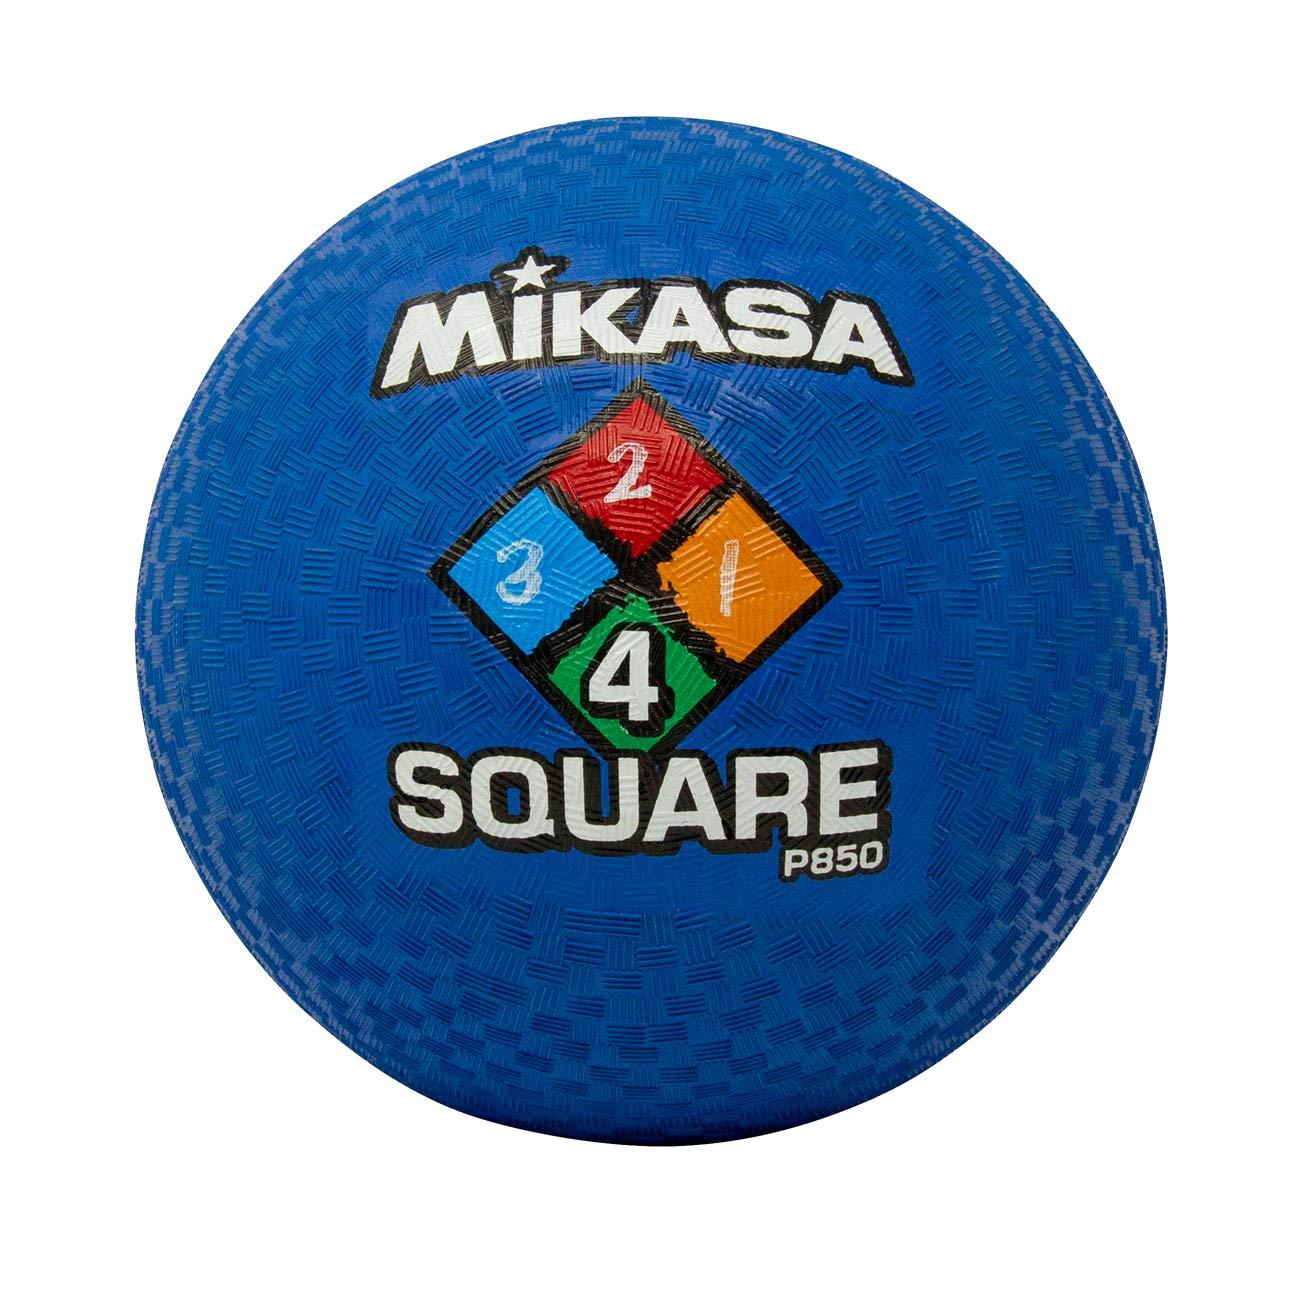 Mikasa Playground Ball (Blue, 8.5-Inch) by MIKASA